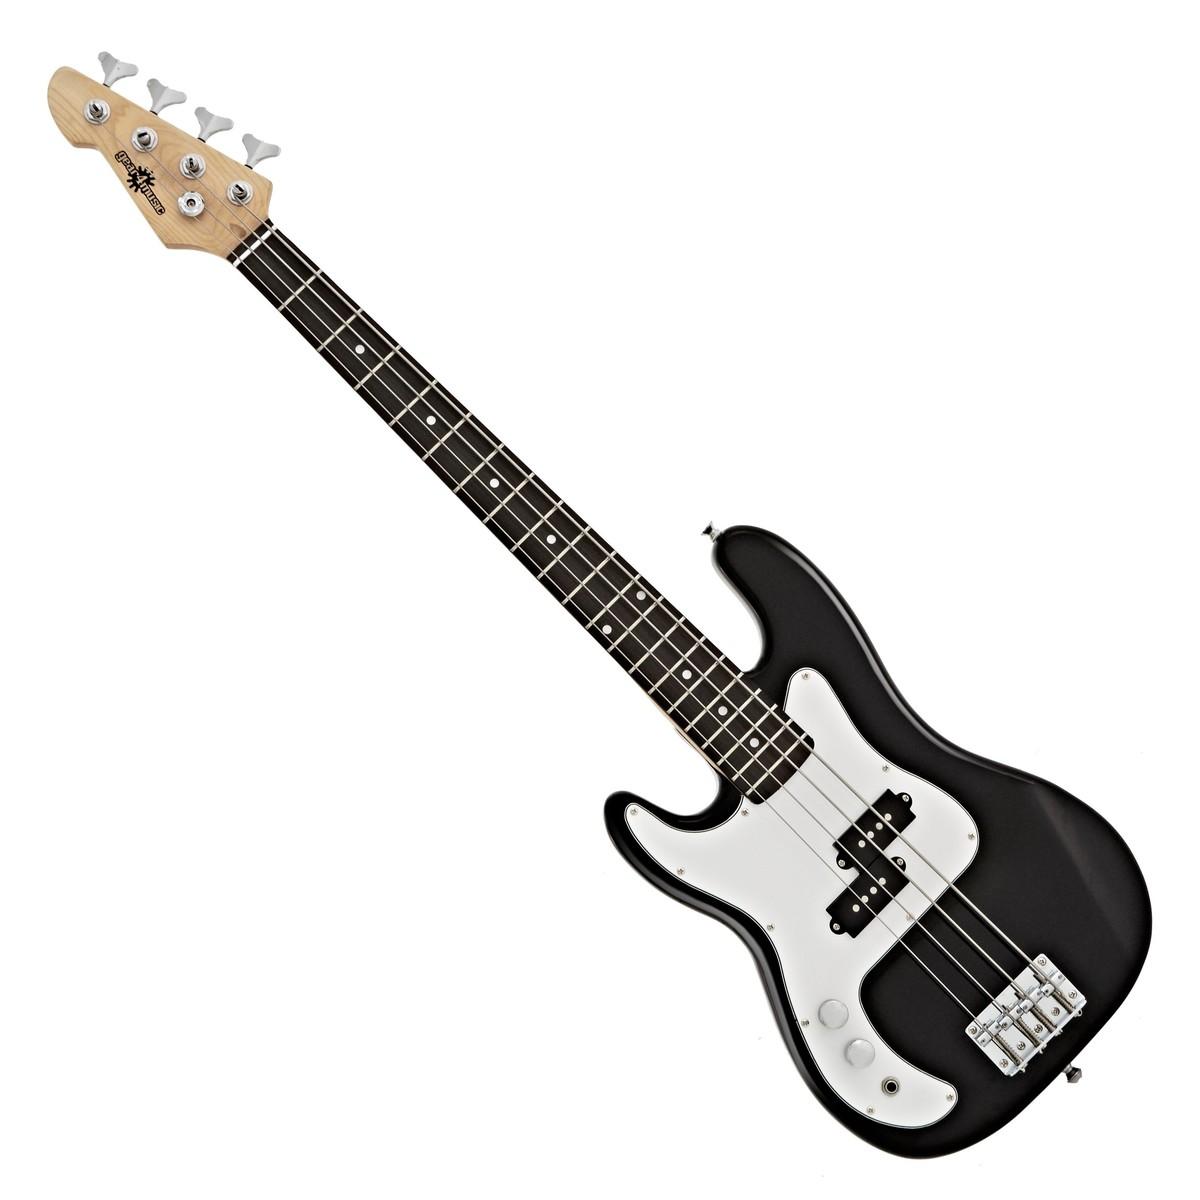 3 4 la left handed bass guitar by gear4music black at gear4music. Black Bedroom Furniture Sets. Home Design Ideas